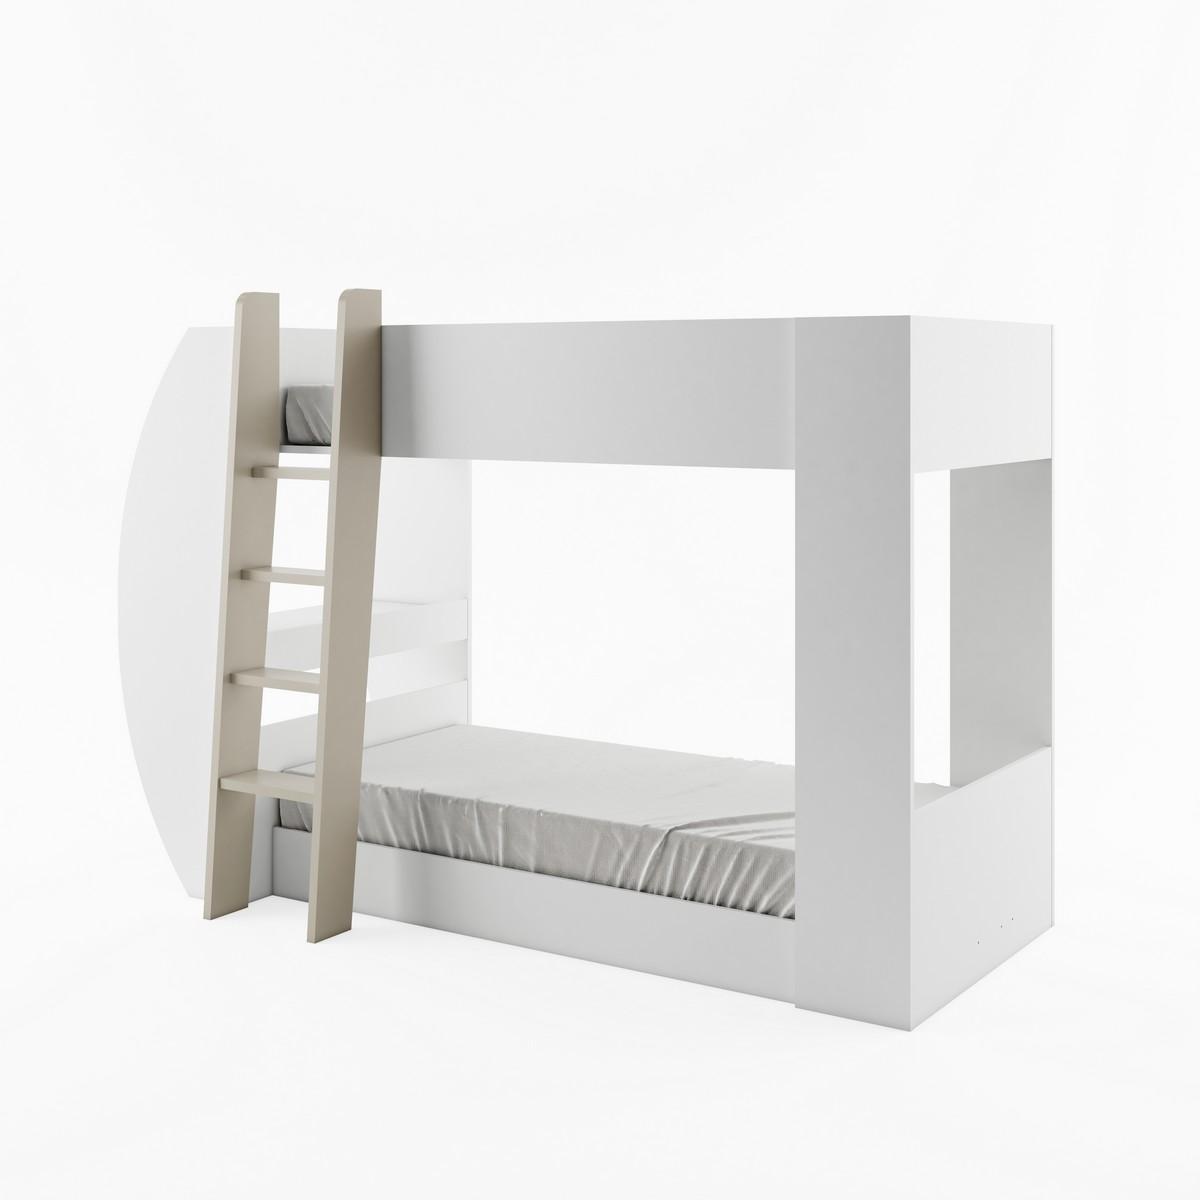 etagenbett multifunktions bett hochbett jerry mit matratzen ebay. Black Bedroom Furniture Sets. Home Design Ideas